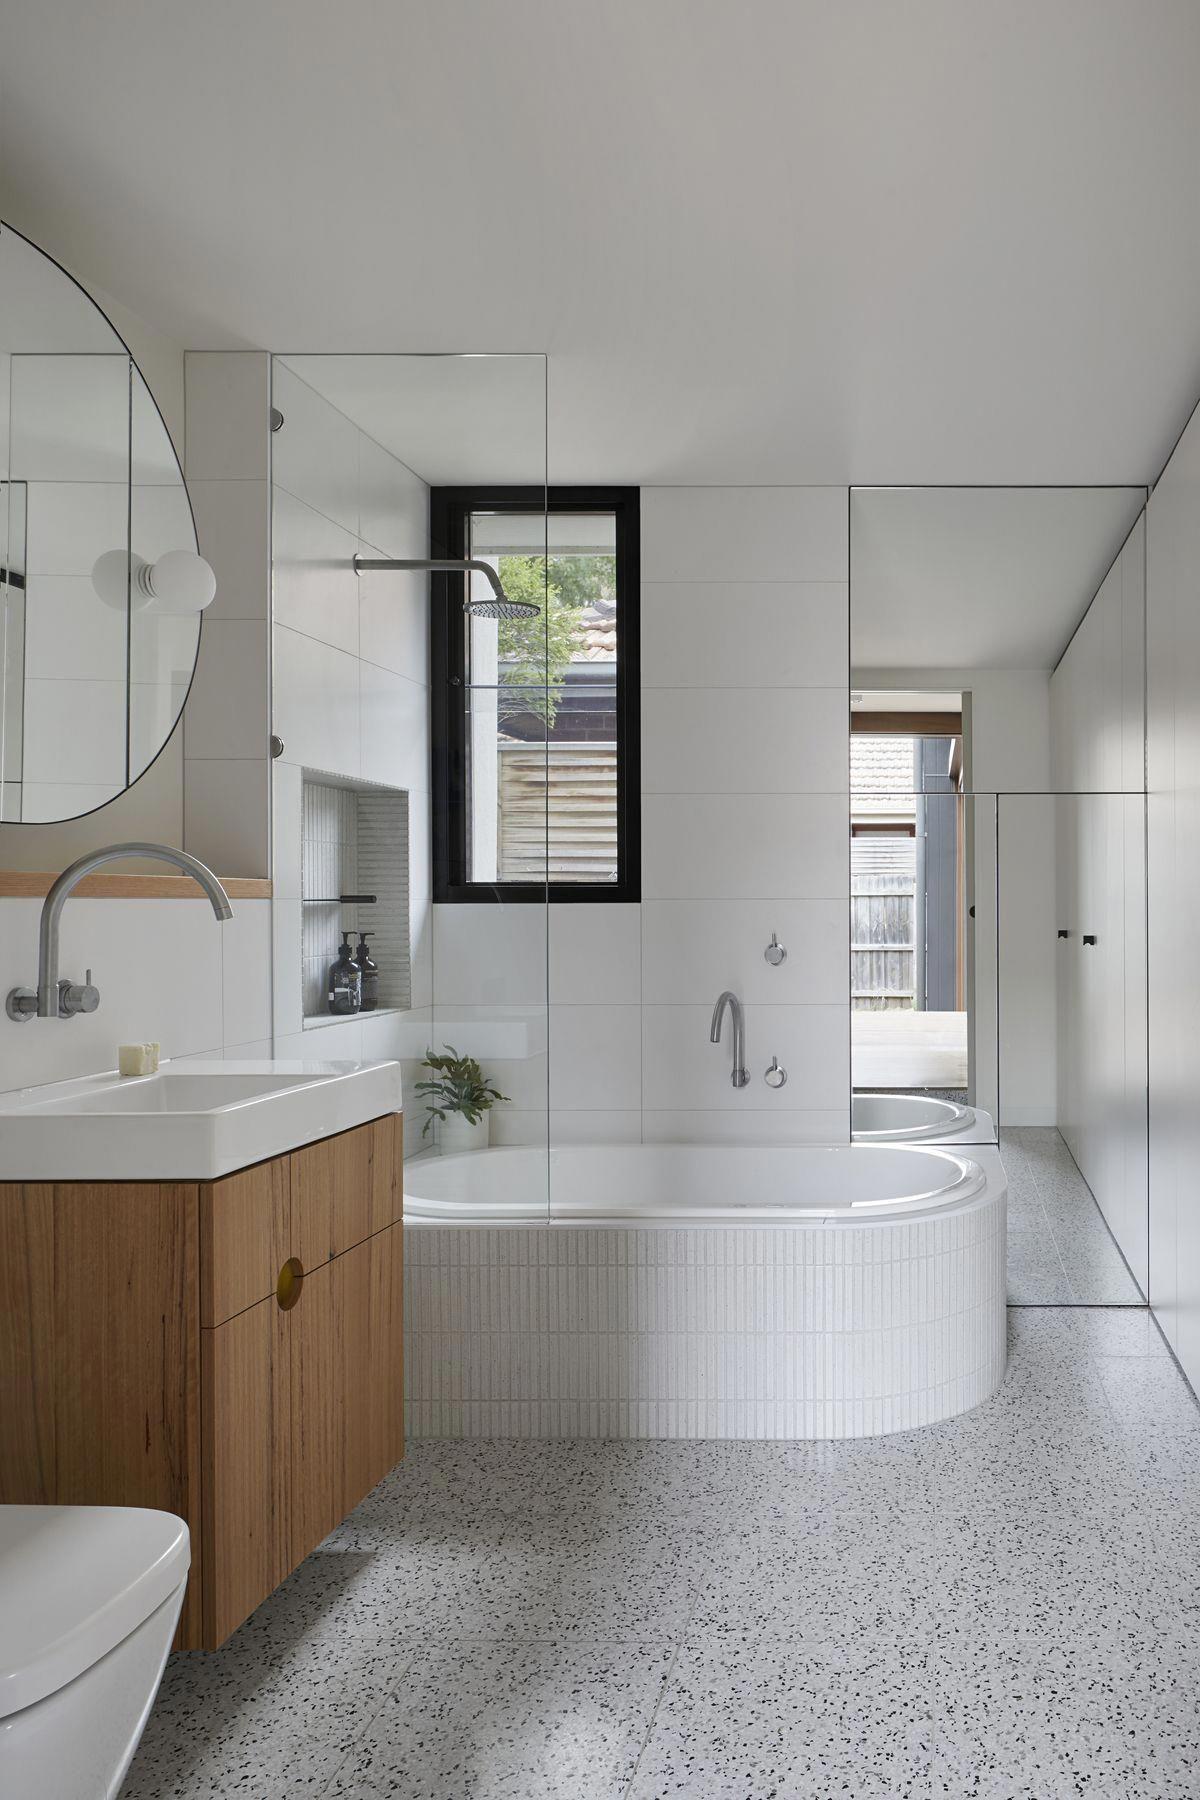 Online Bathroom Design Software Virtual Bathroom Design Software 2016 Downloads Revi Bathroom Design Software Home Design Software Bathroom Design Layout